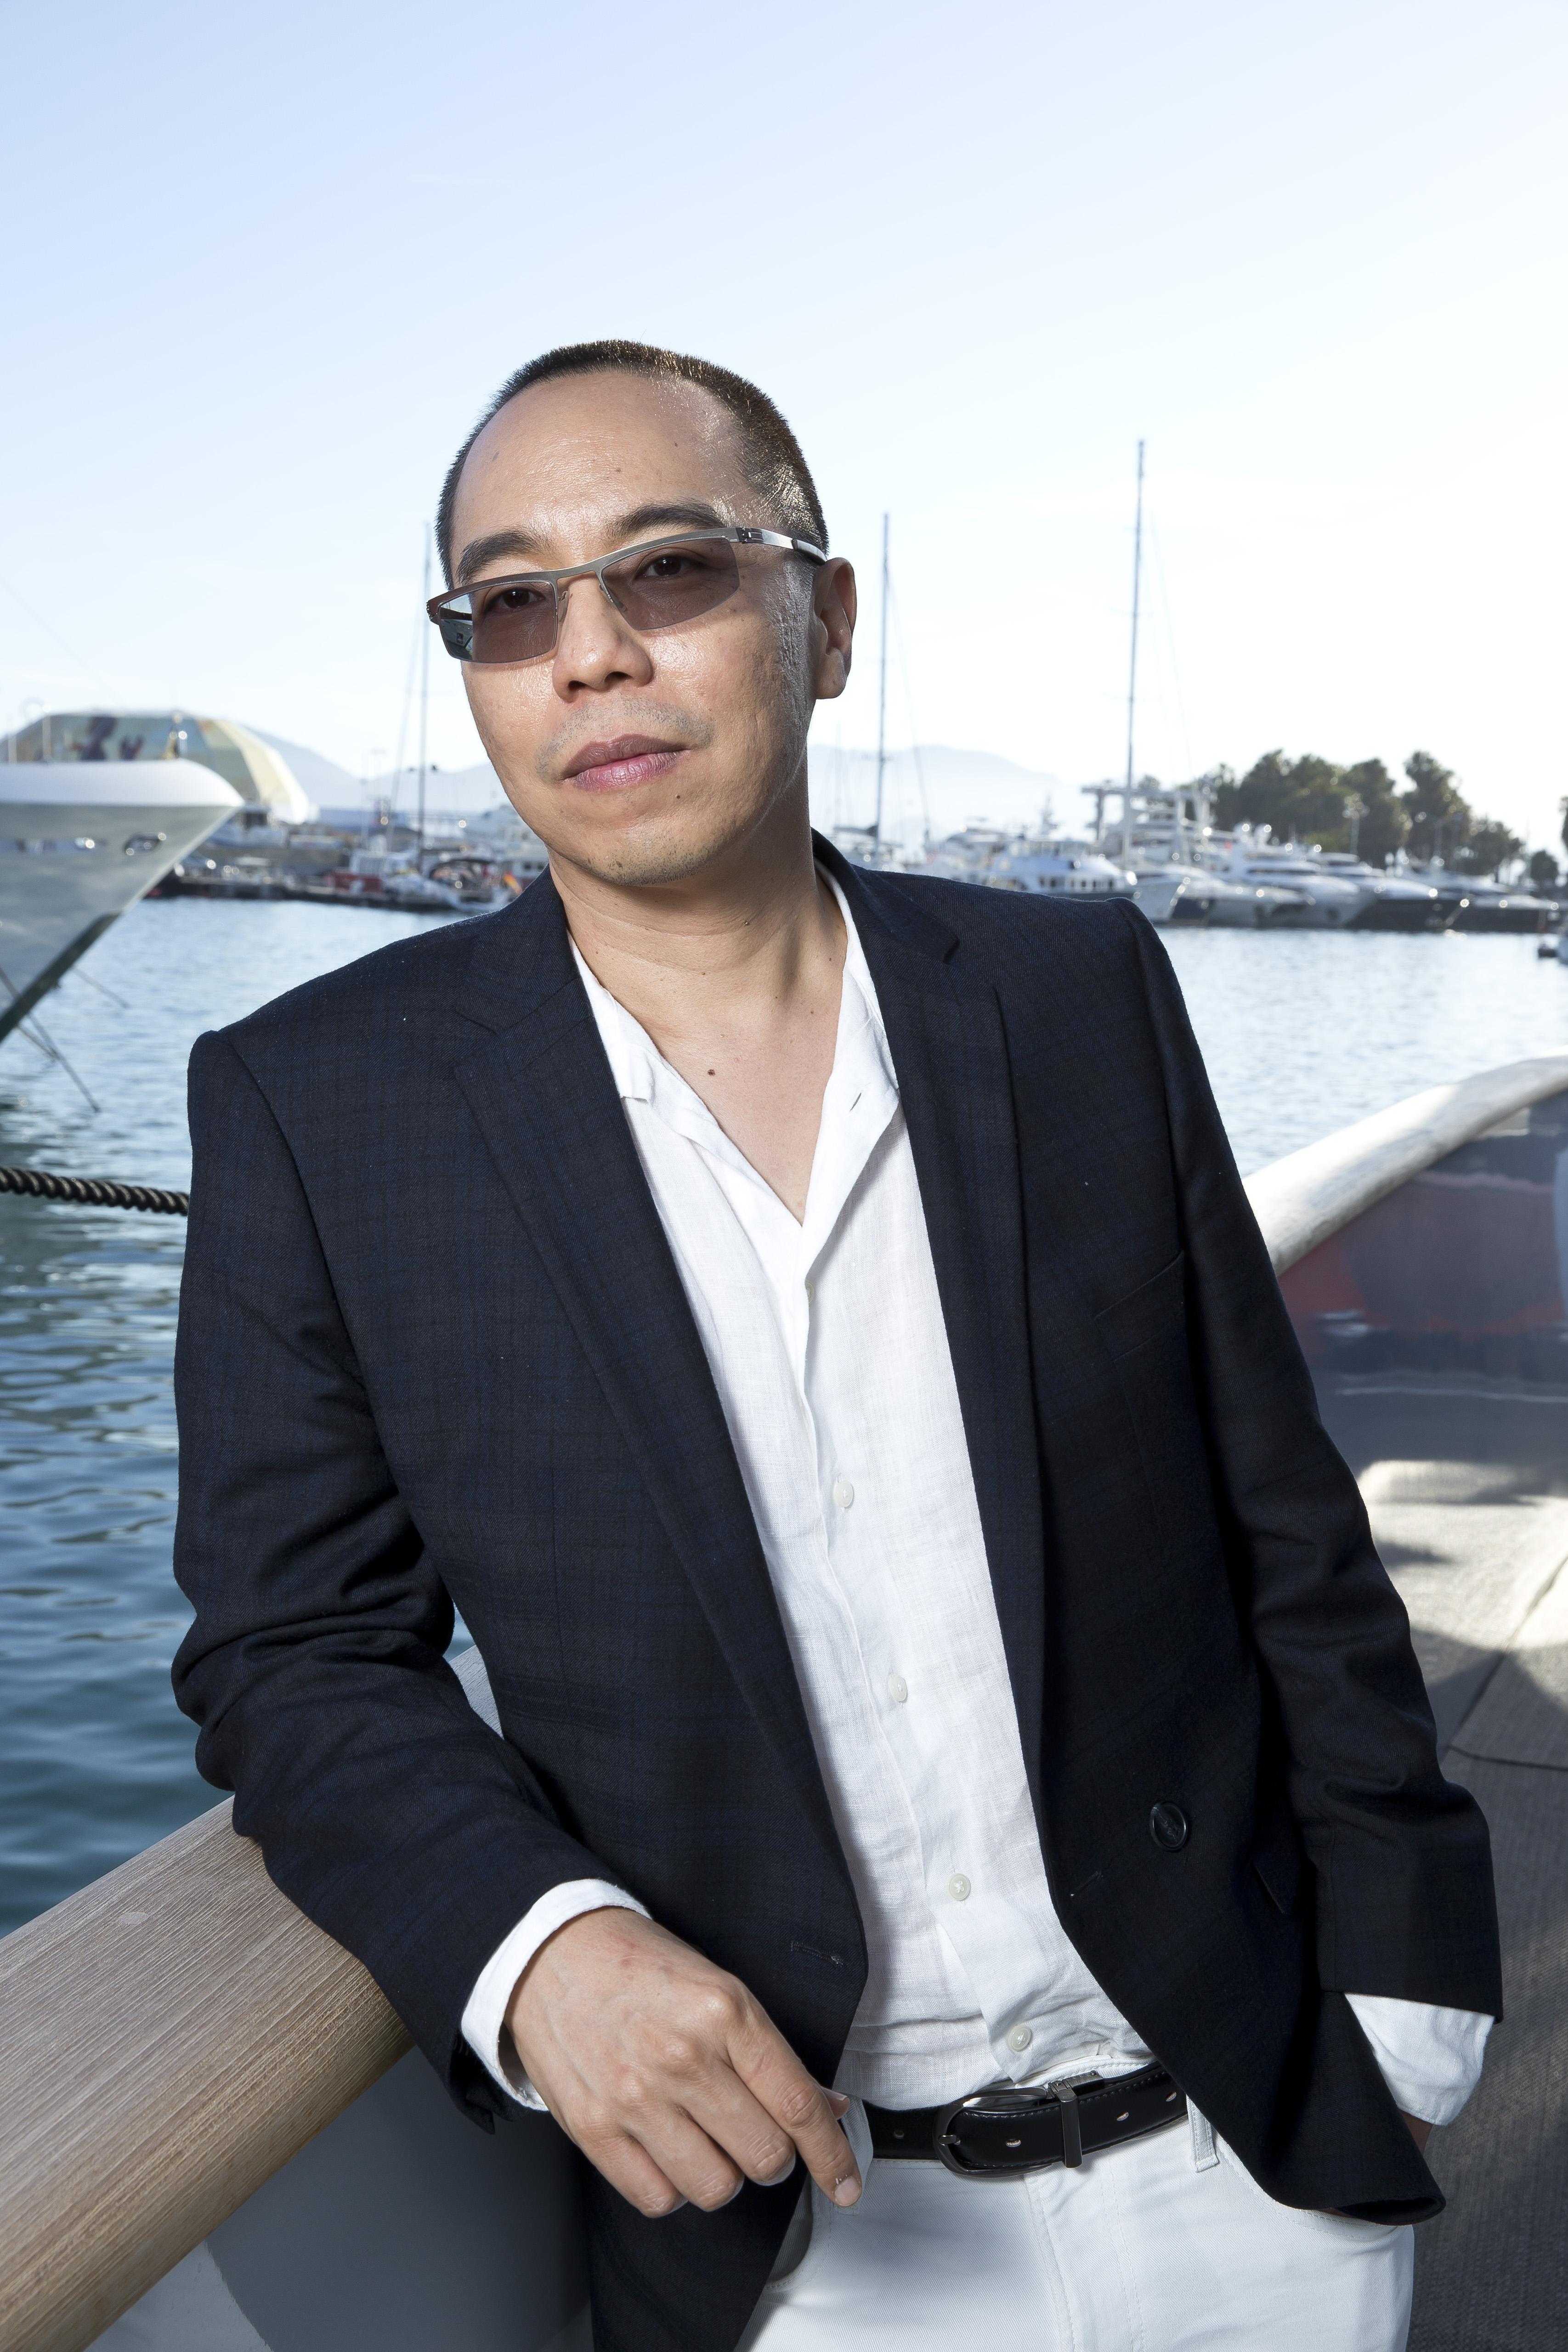 Apichatpong Weerasethakul par Paul Blind, Cannes 2015